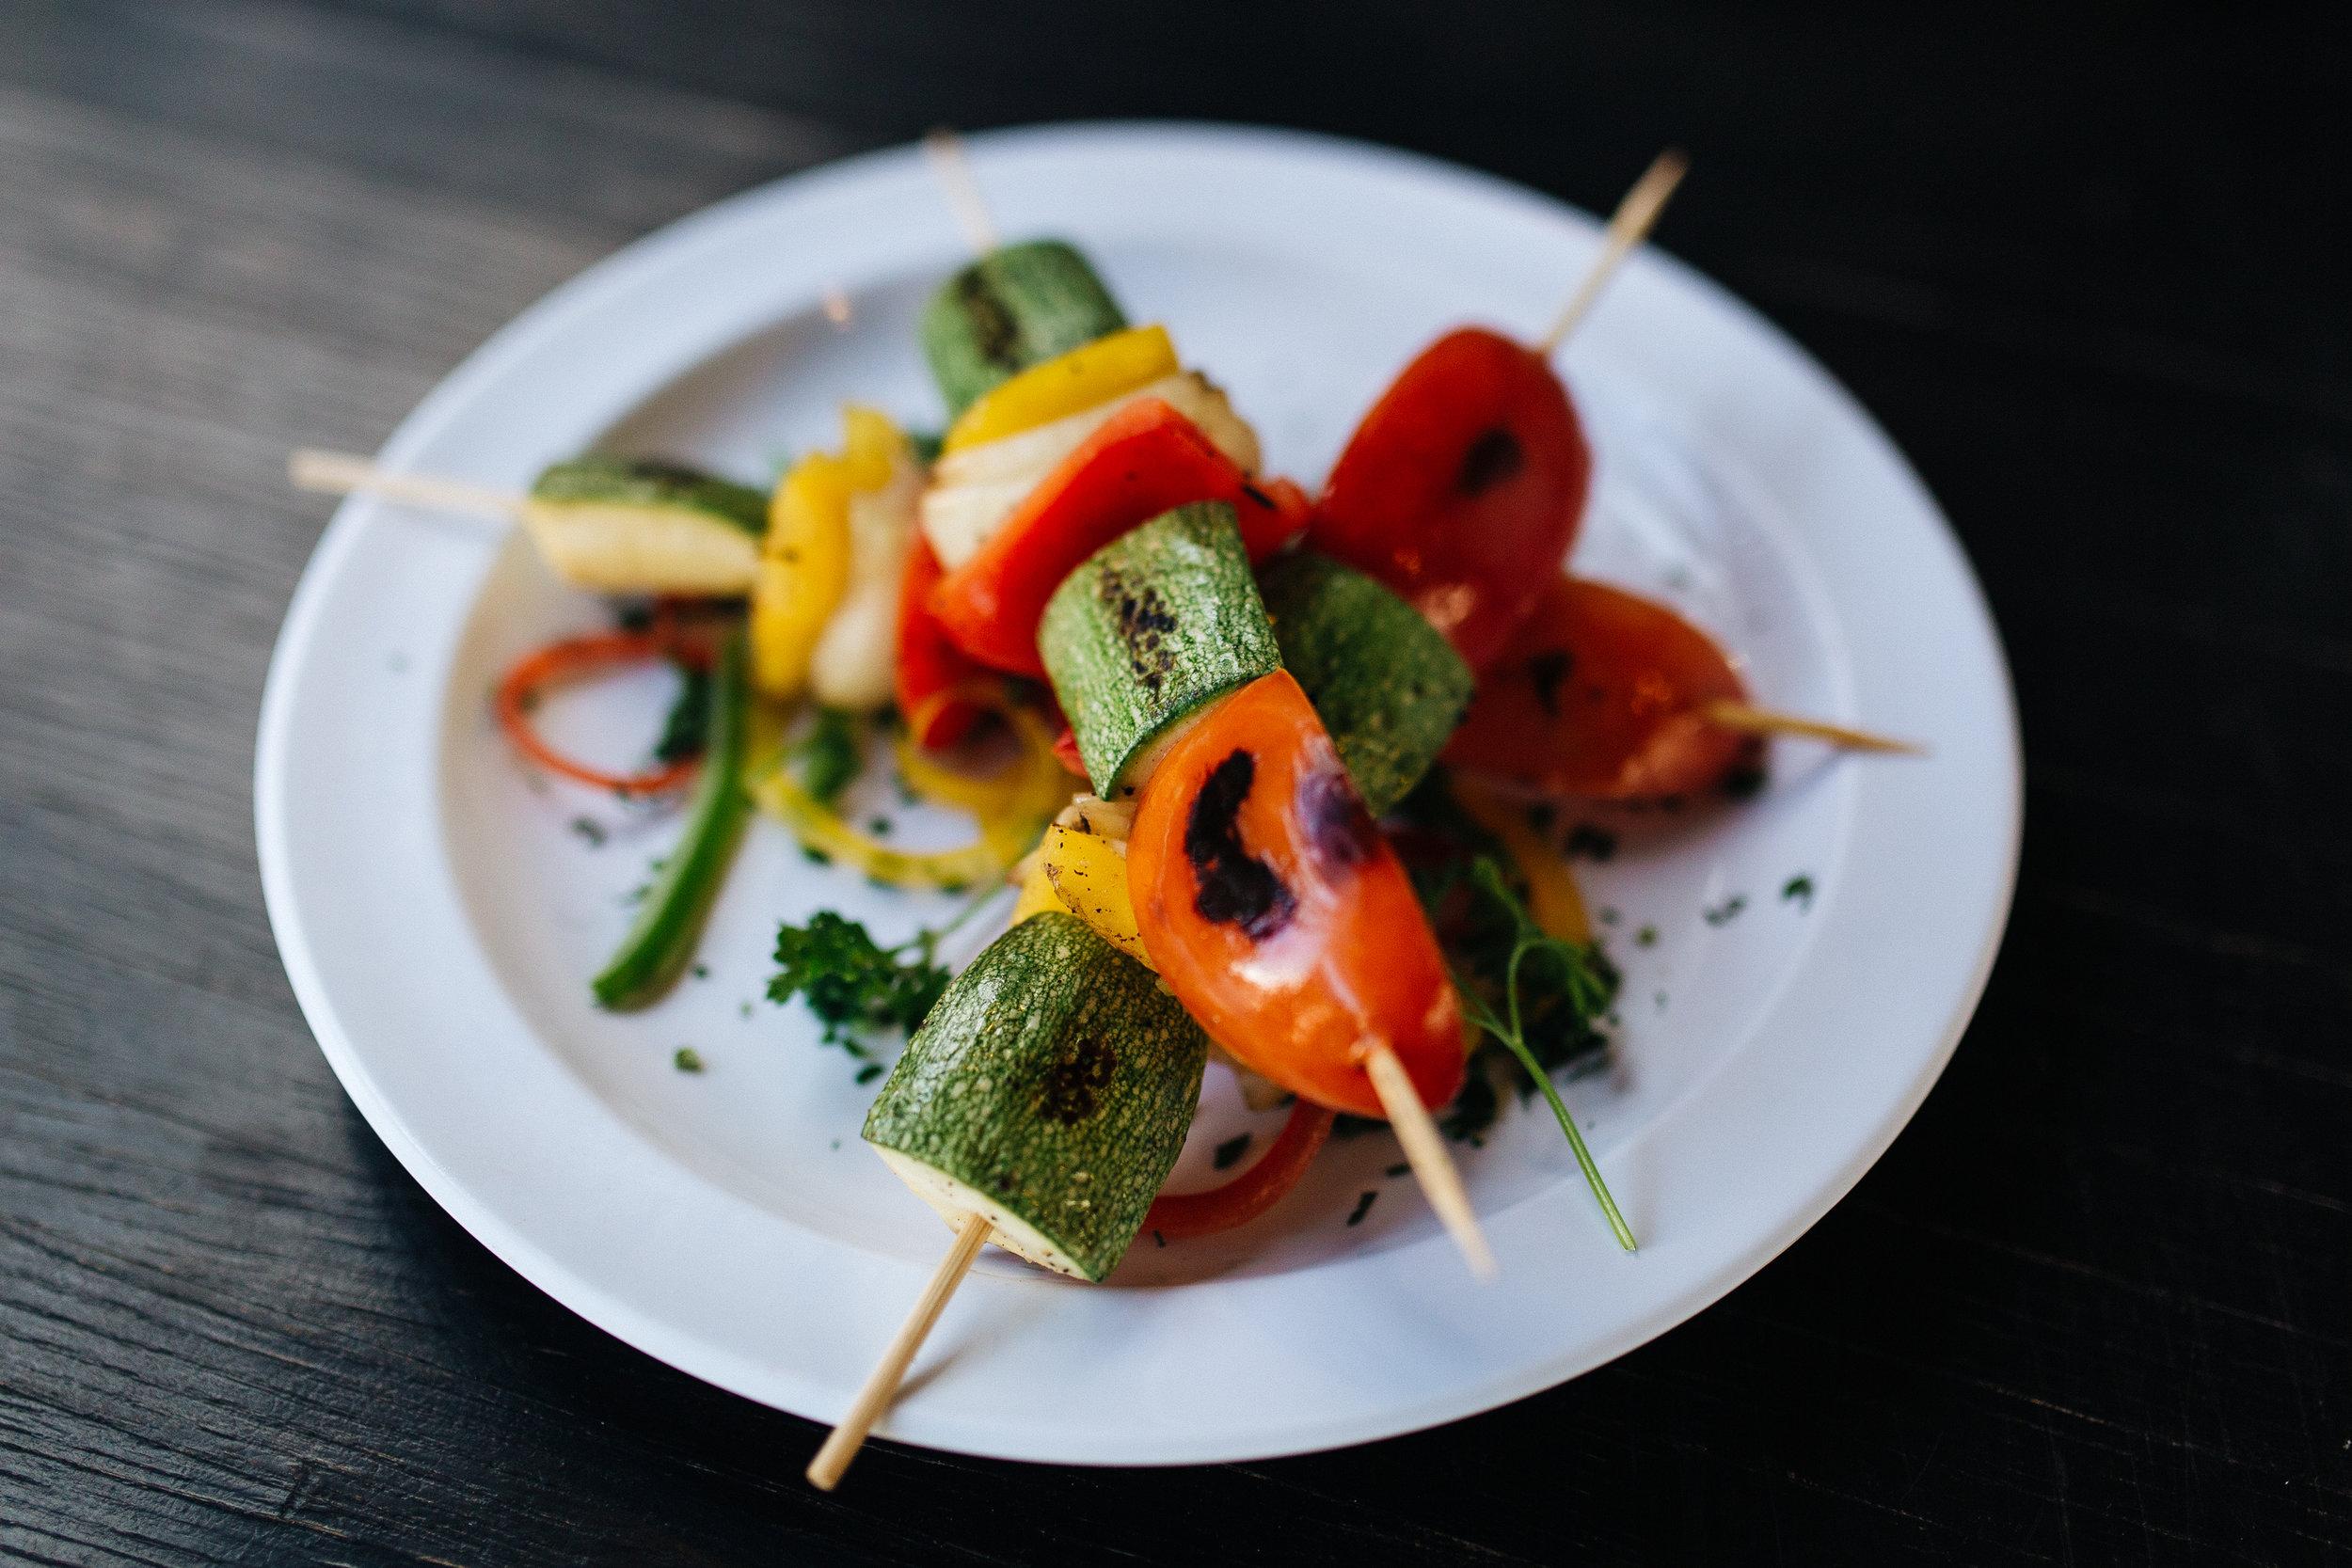 Dinner 1: Grilled Veggies